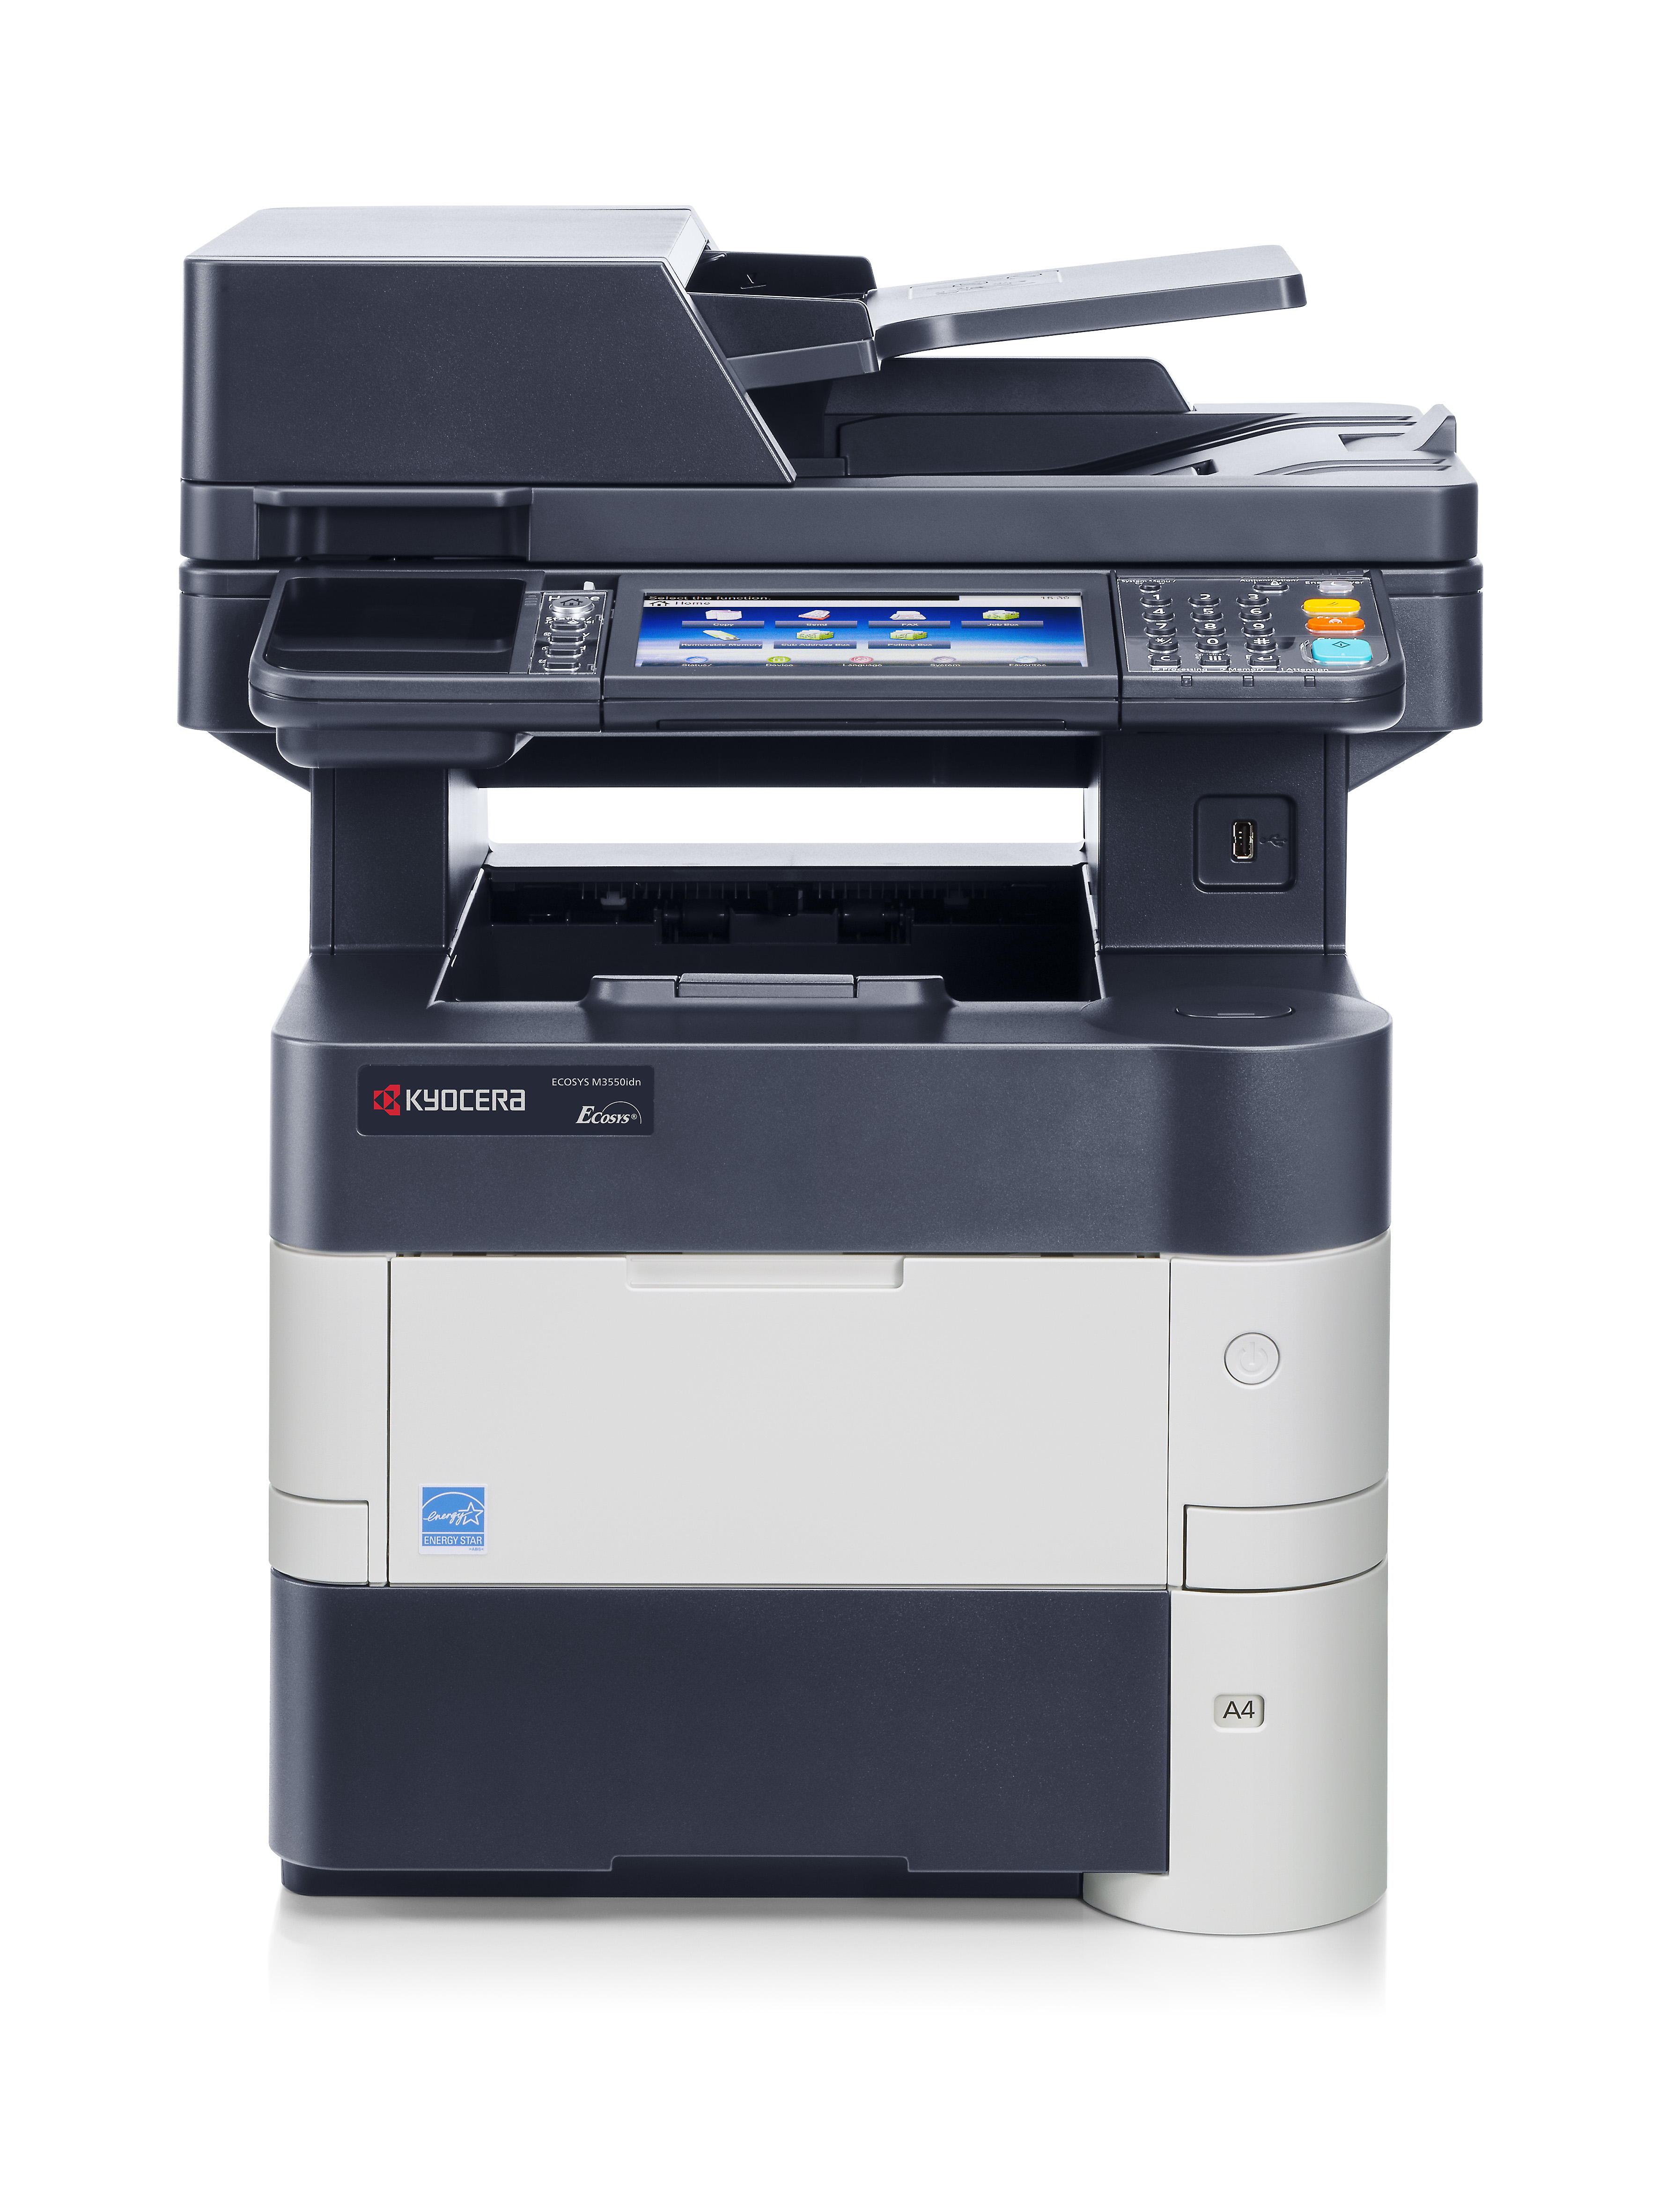 Kyocera ECOSYS M3550idn/KL3 - Multifunktionsdrucker - s/w